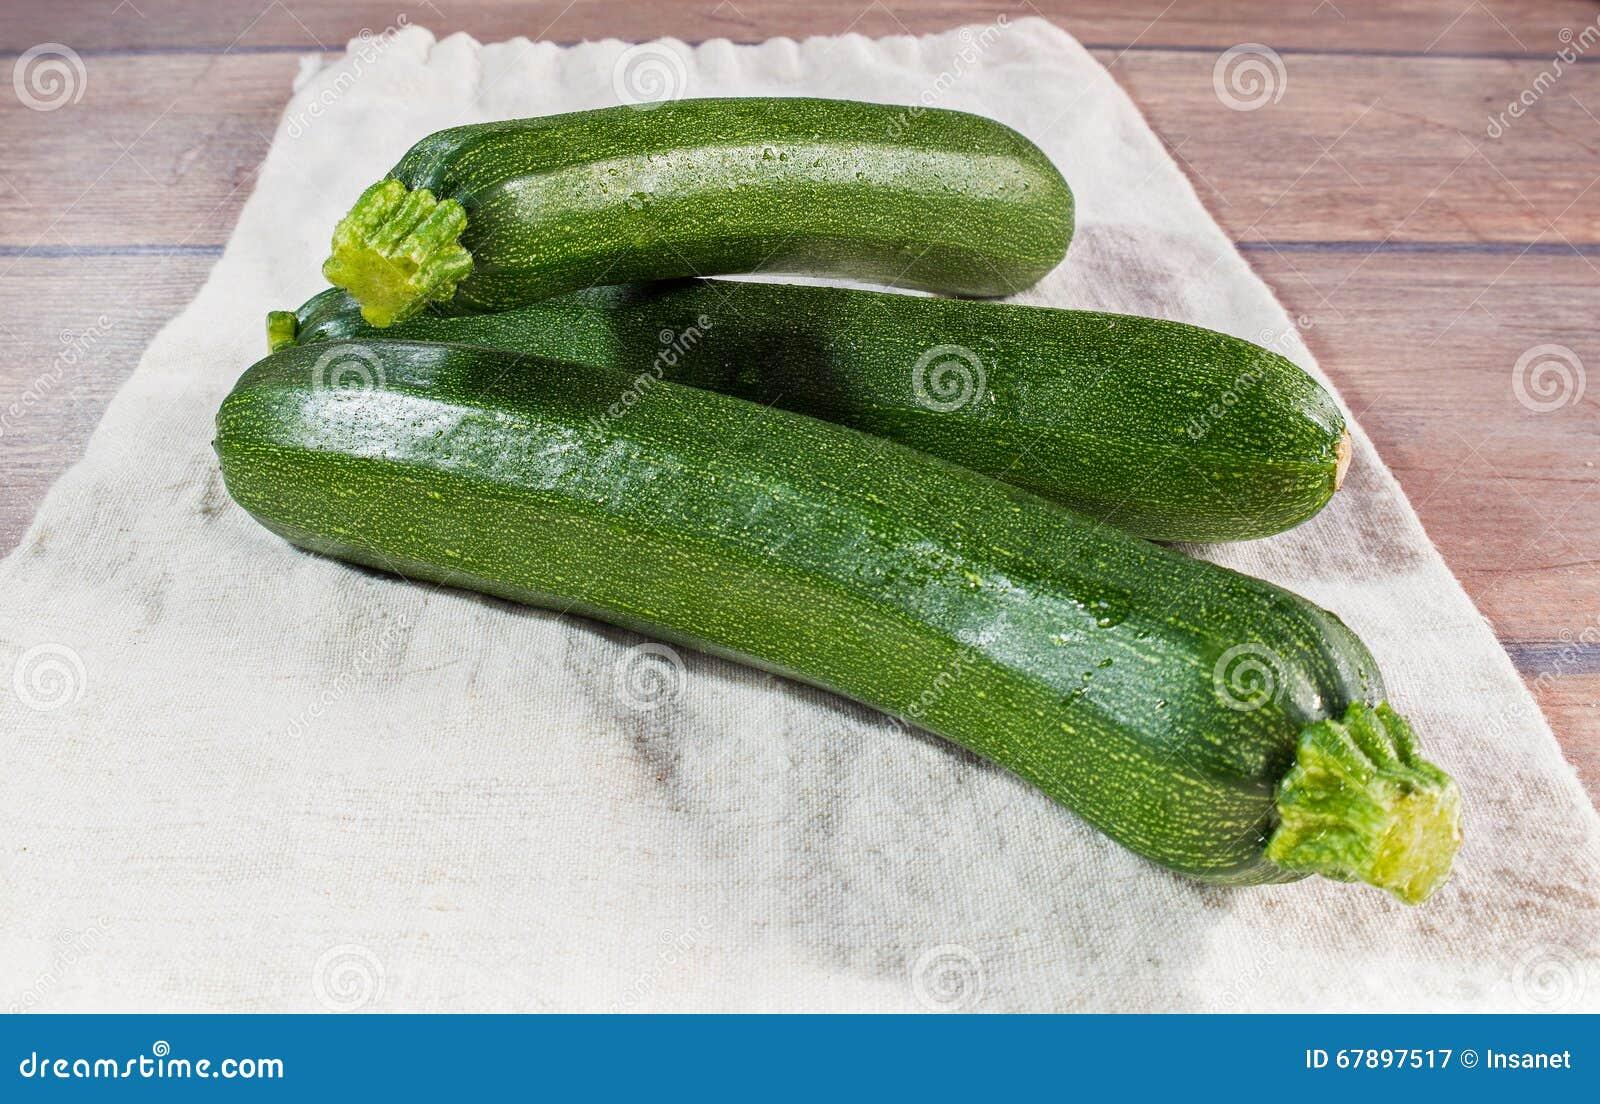 Ny ung zucchini